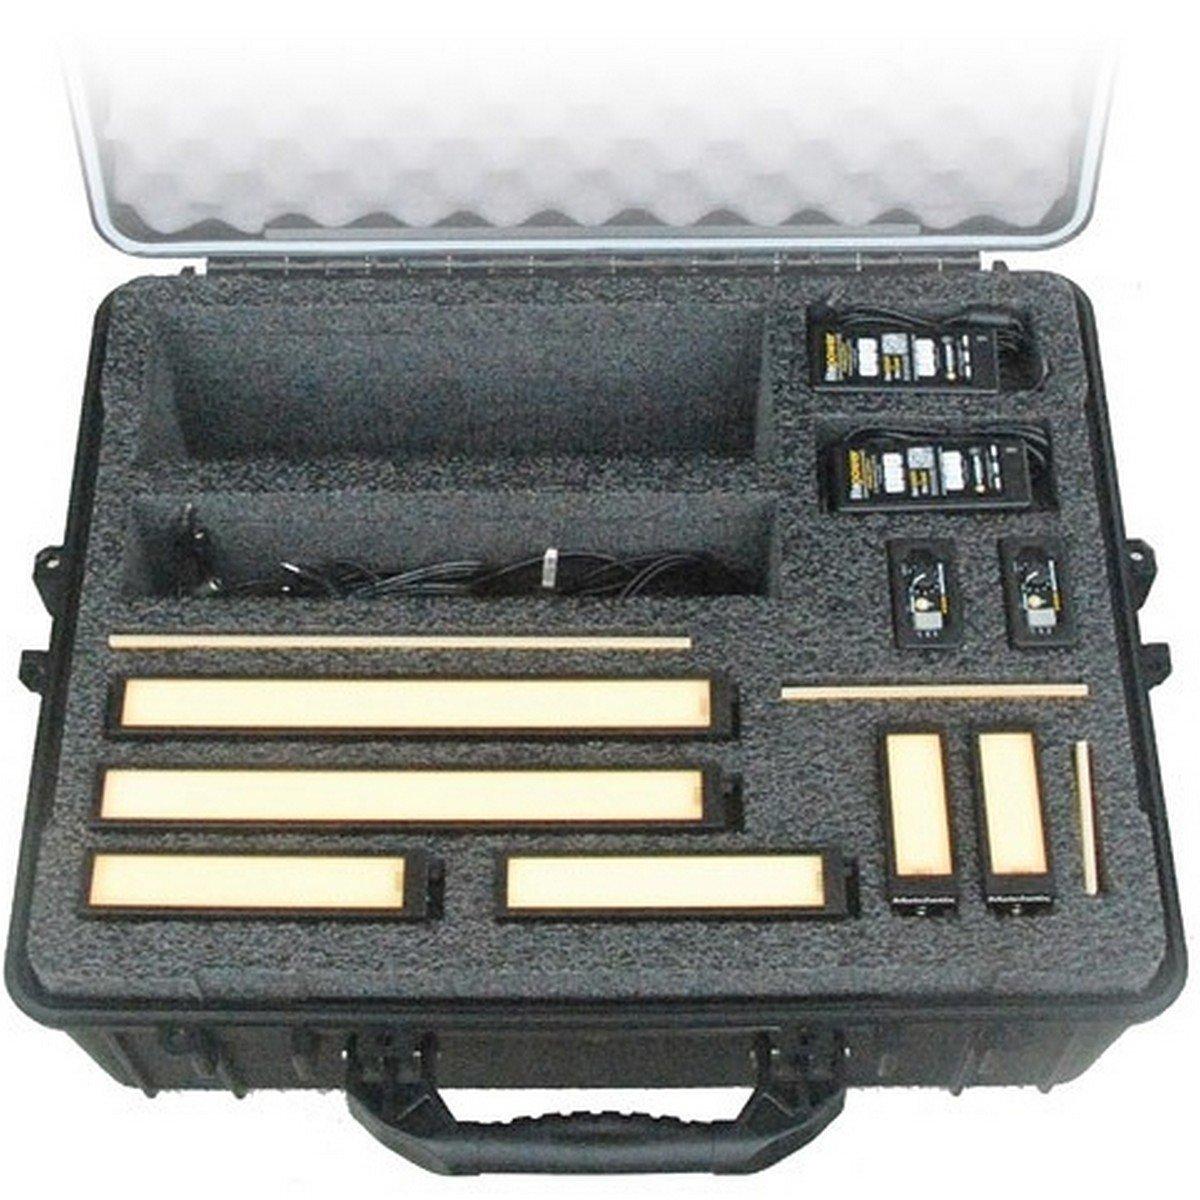 Cineo Lighting Matchstix DuoPro Kit   Versatile Light Source 3inch 6inch 12inch 701.0222